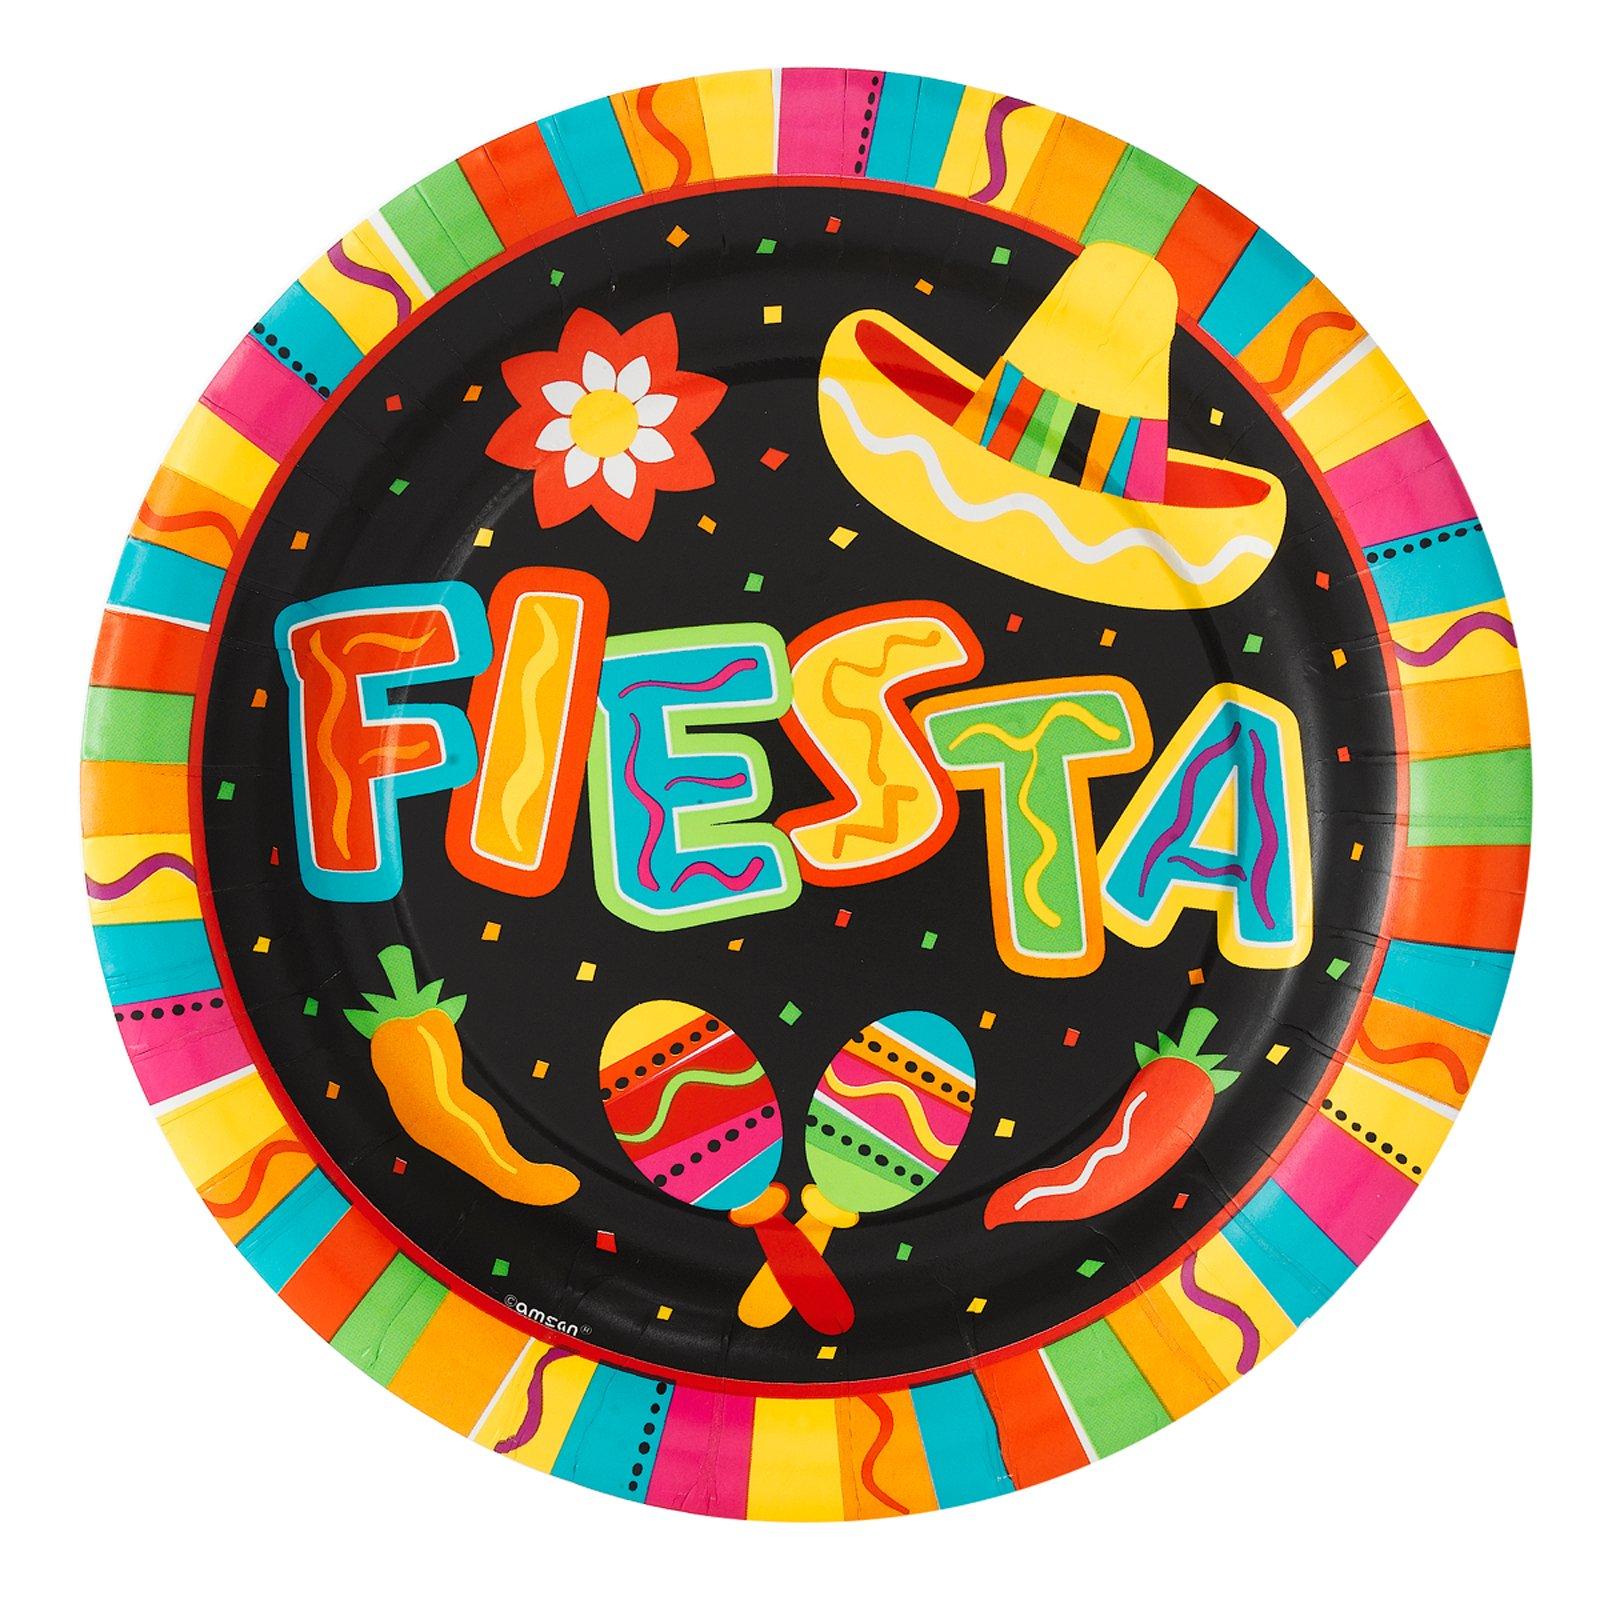 47+] San Antonio Fiesta Wallpaper on WallpaperSafari